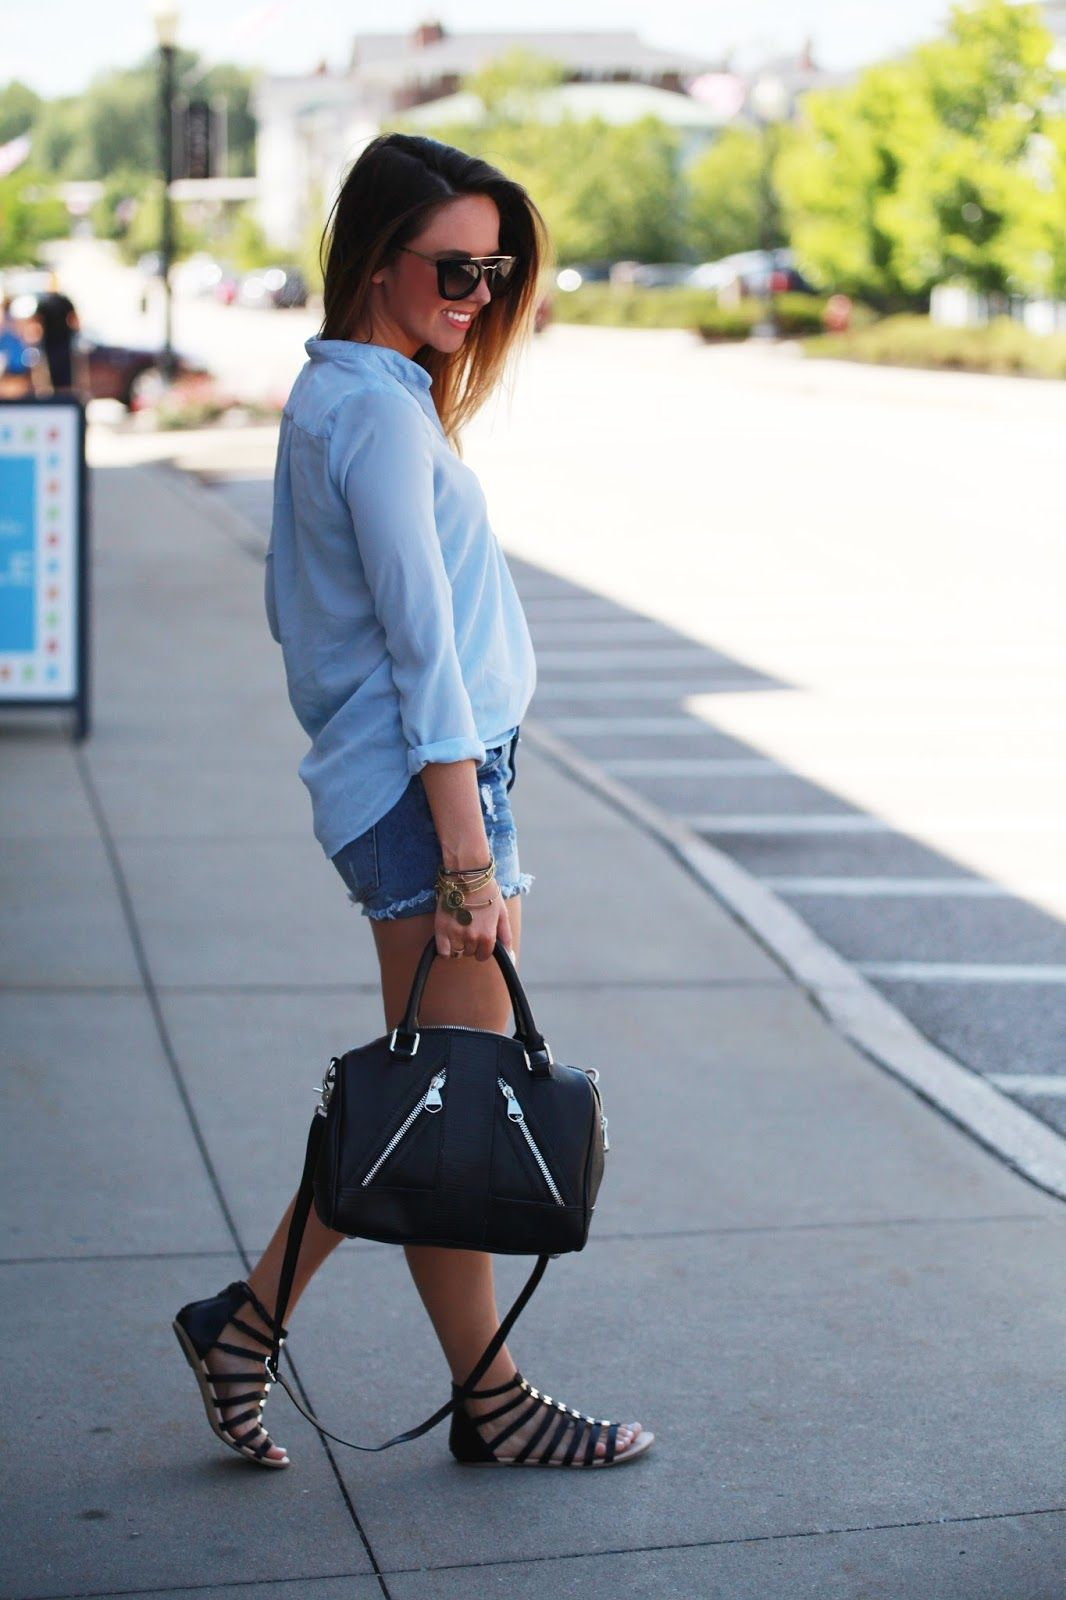 http://dolcevitahandbags.com/search?q=charlotte+satchel